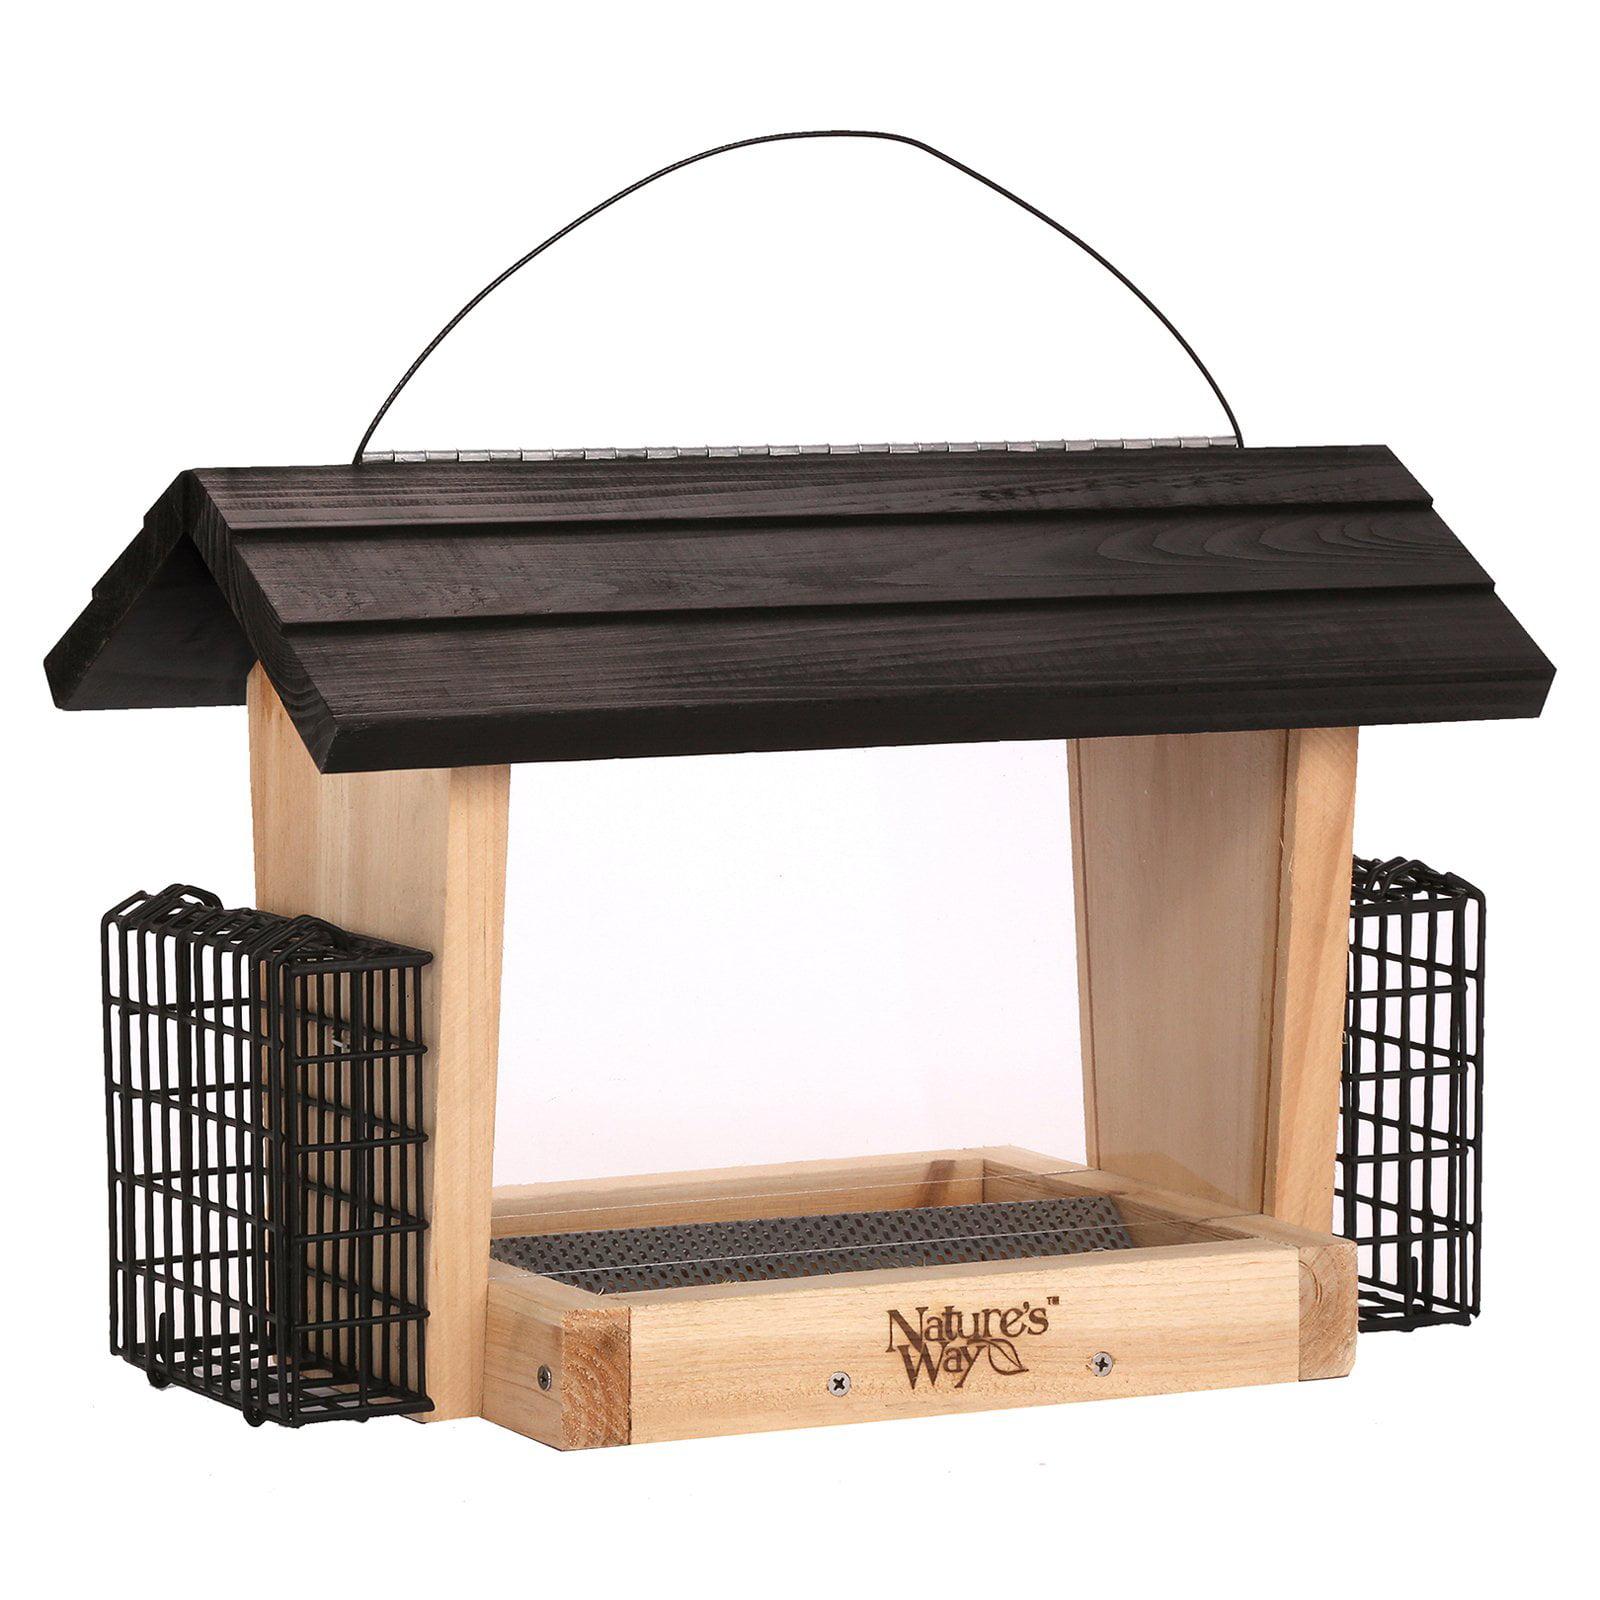 Nature's Way 6 qt. Cedar Hopper Feeder with 2 Suet Cages